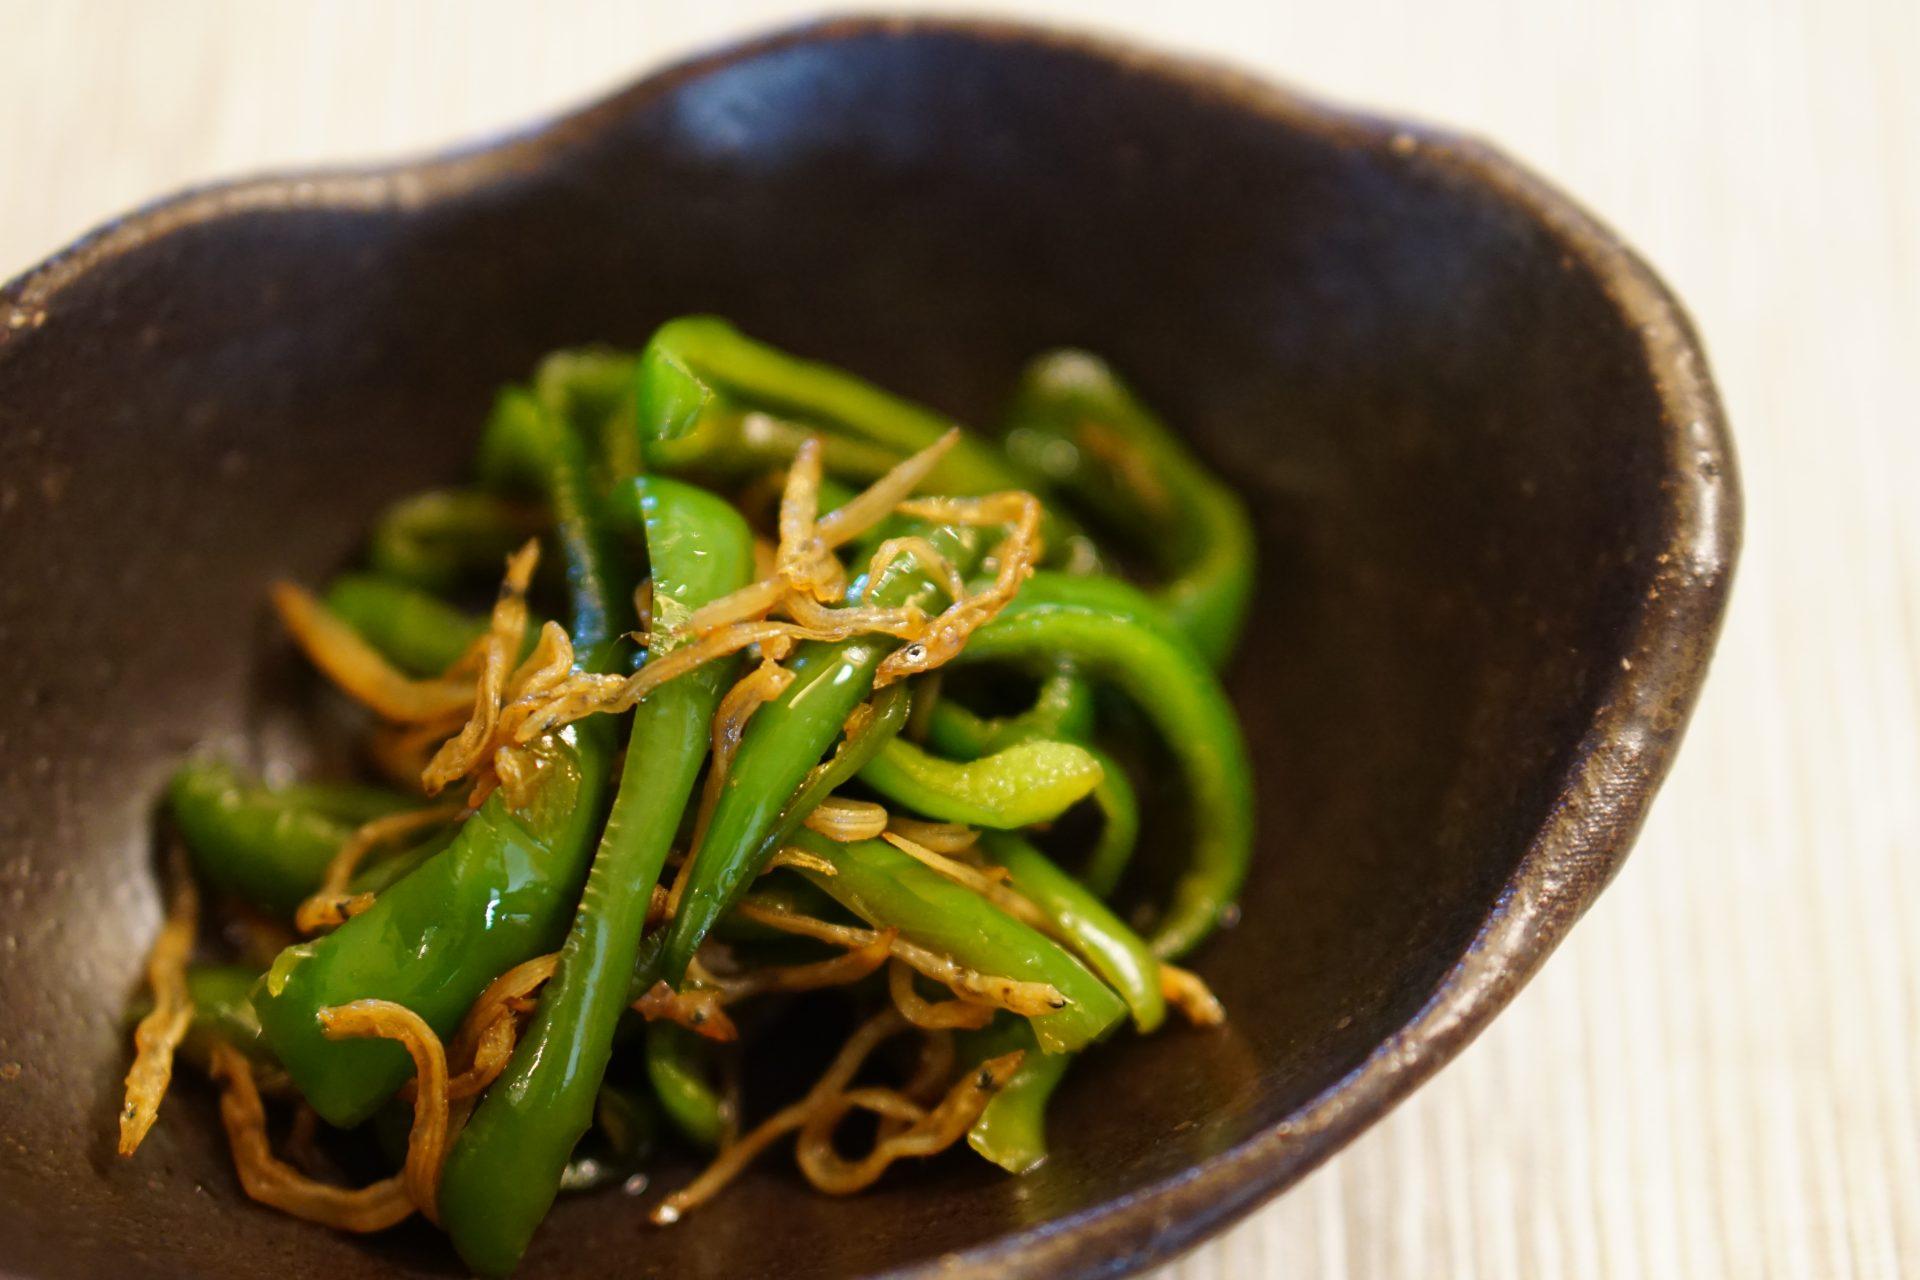 Green Pepper and Chirimenjako Stir Fry